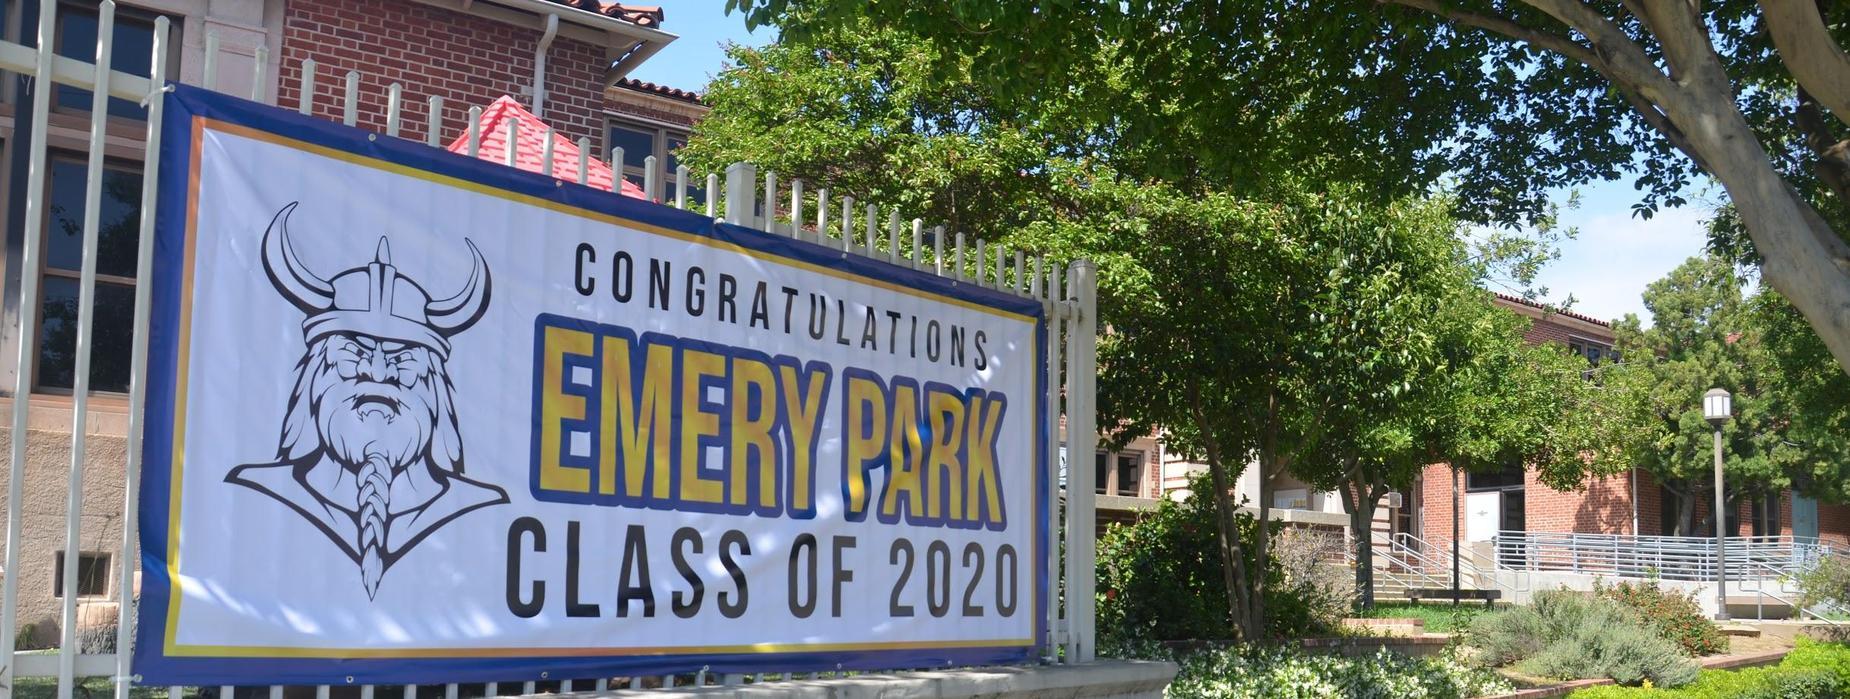 Emery Park Class of 2020 Banner